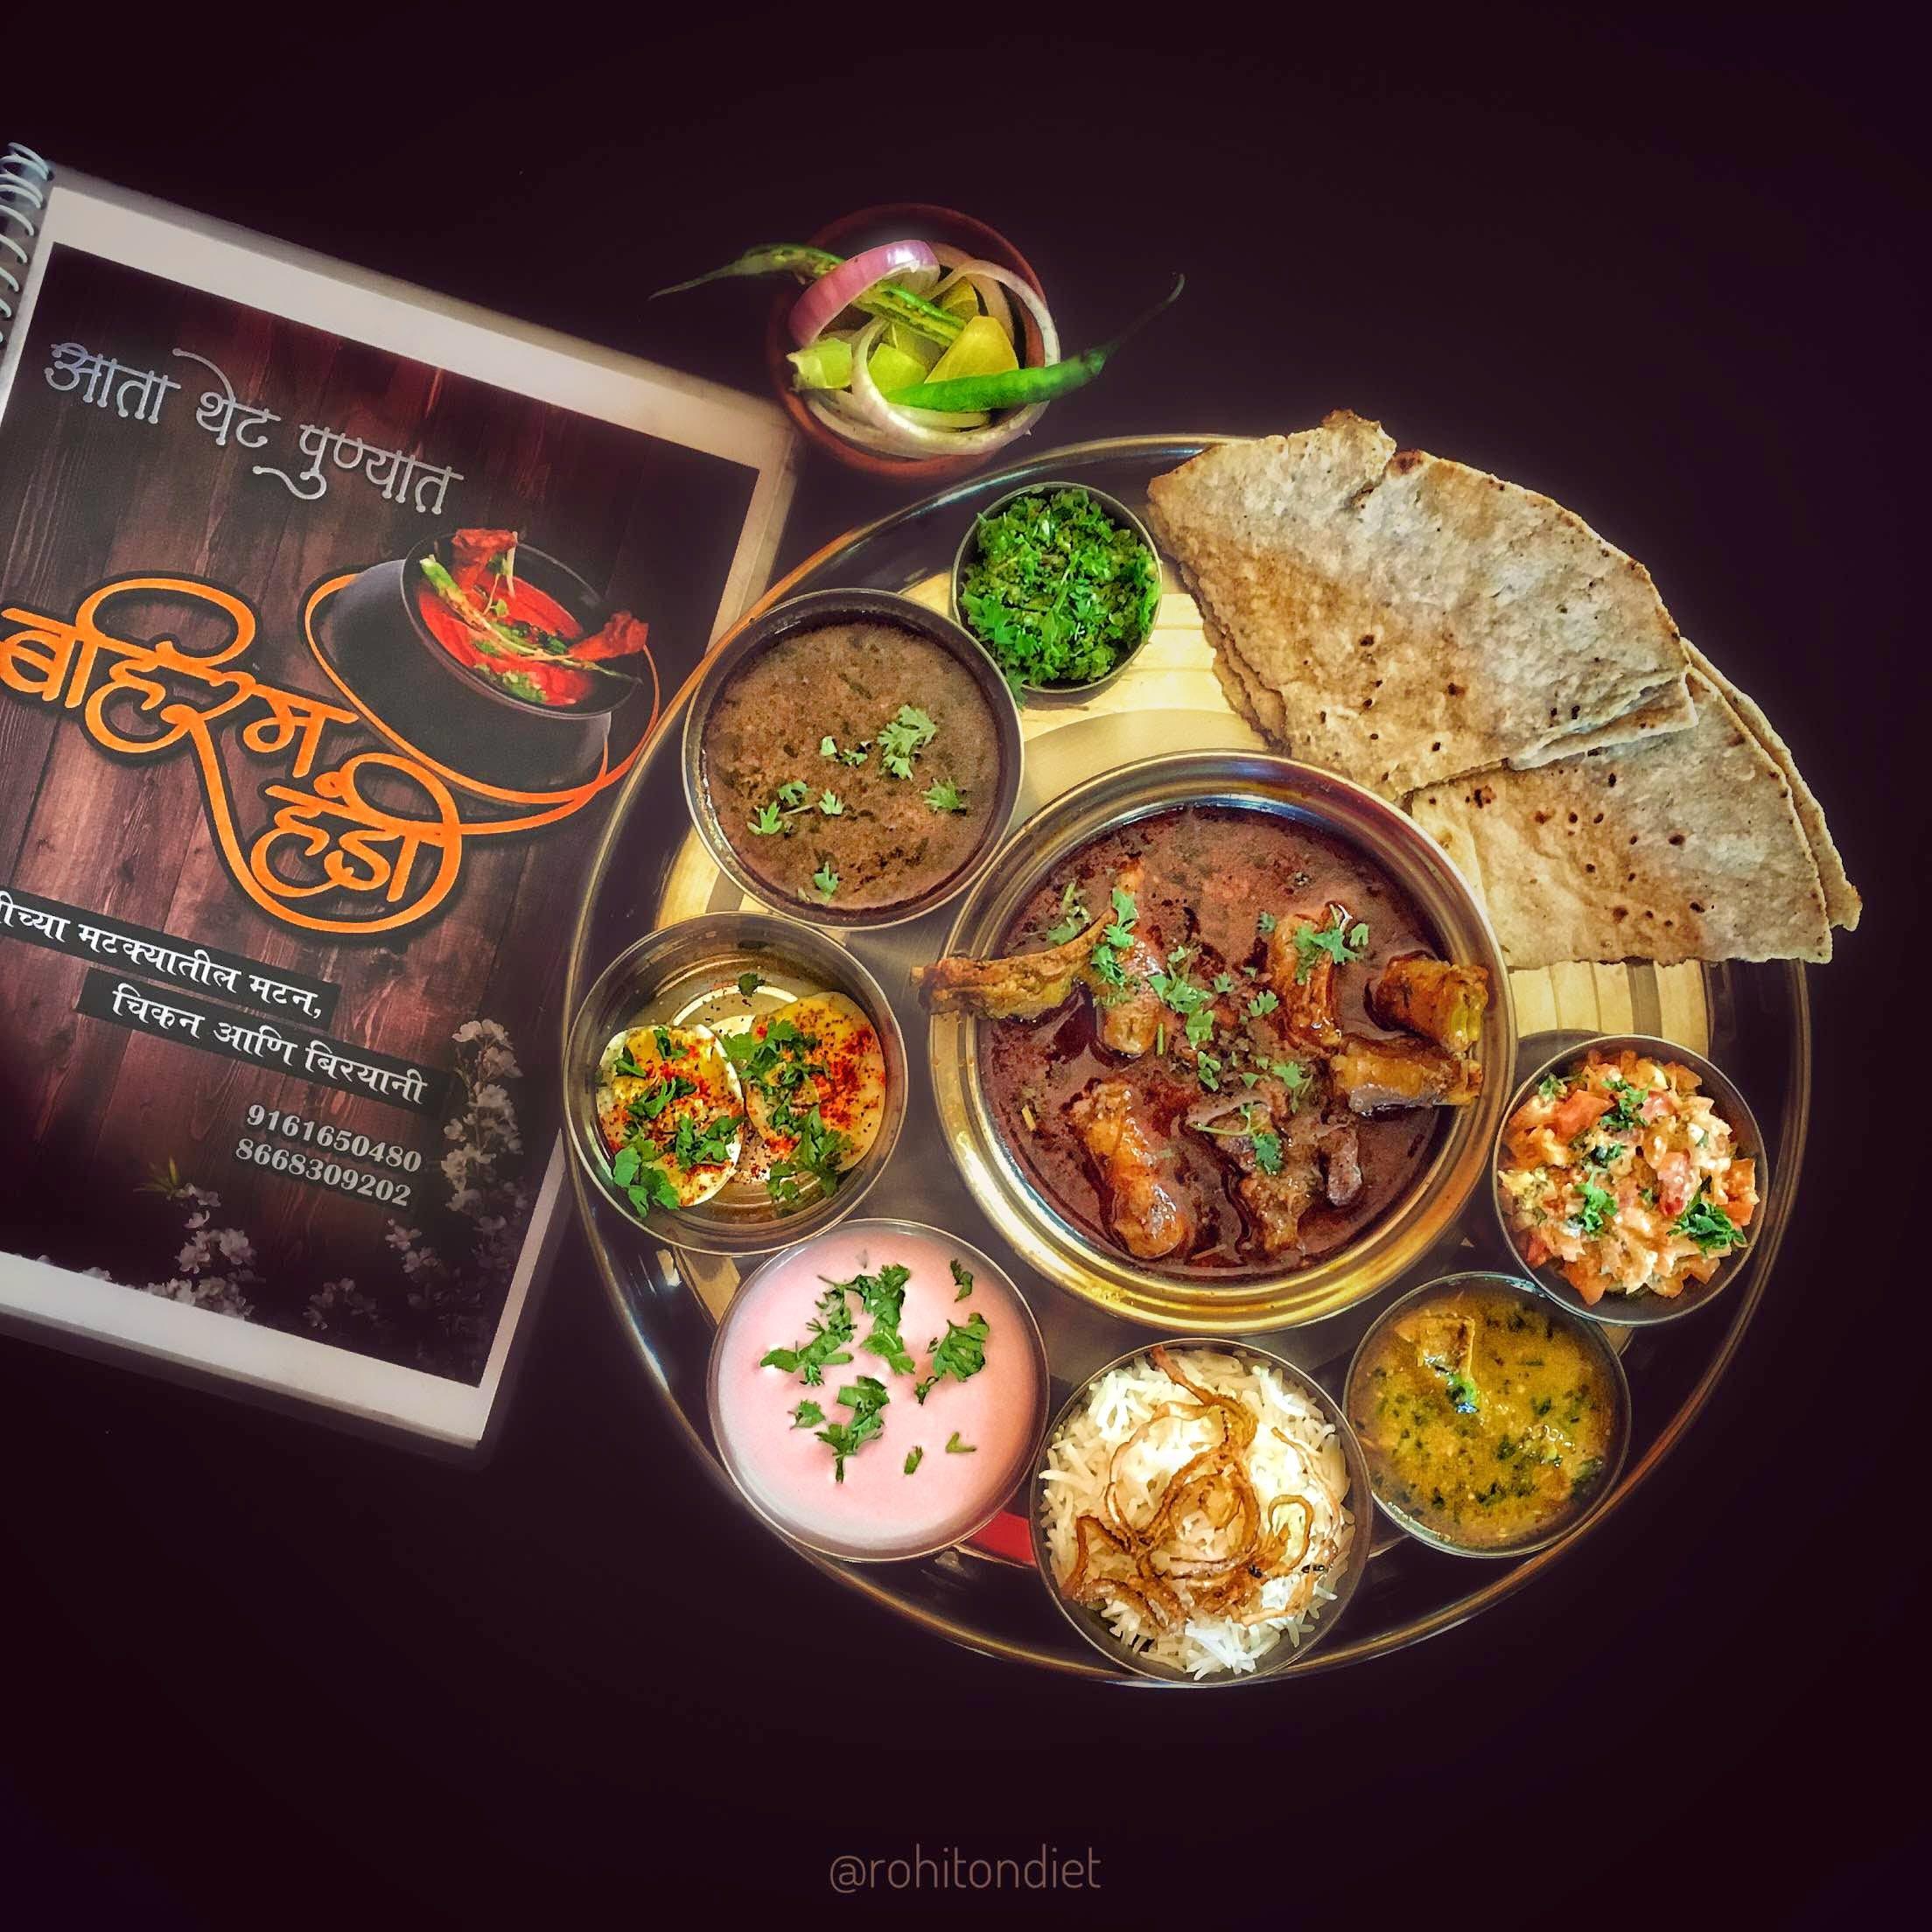 Dish,Cuisine,Food,Meal,Ingredient,Comfort food,Indian cuisine,Curry,Vegetarian food,Produce